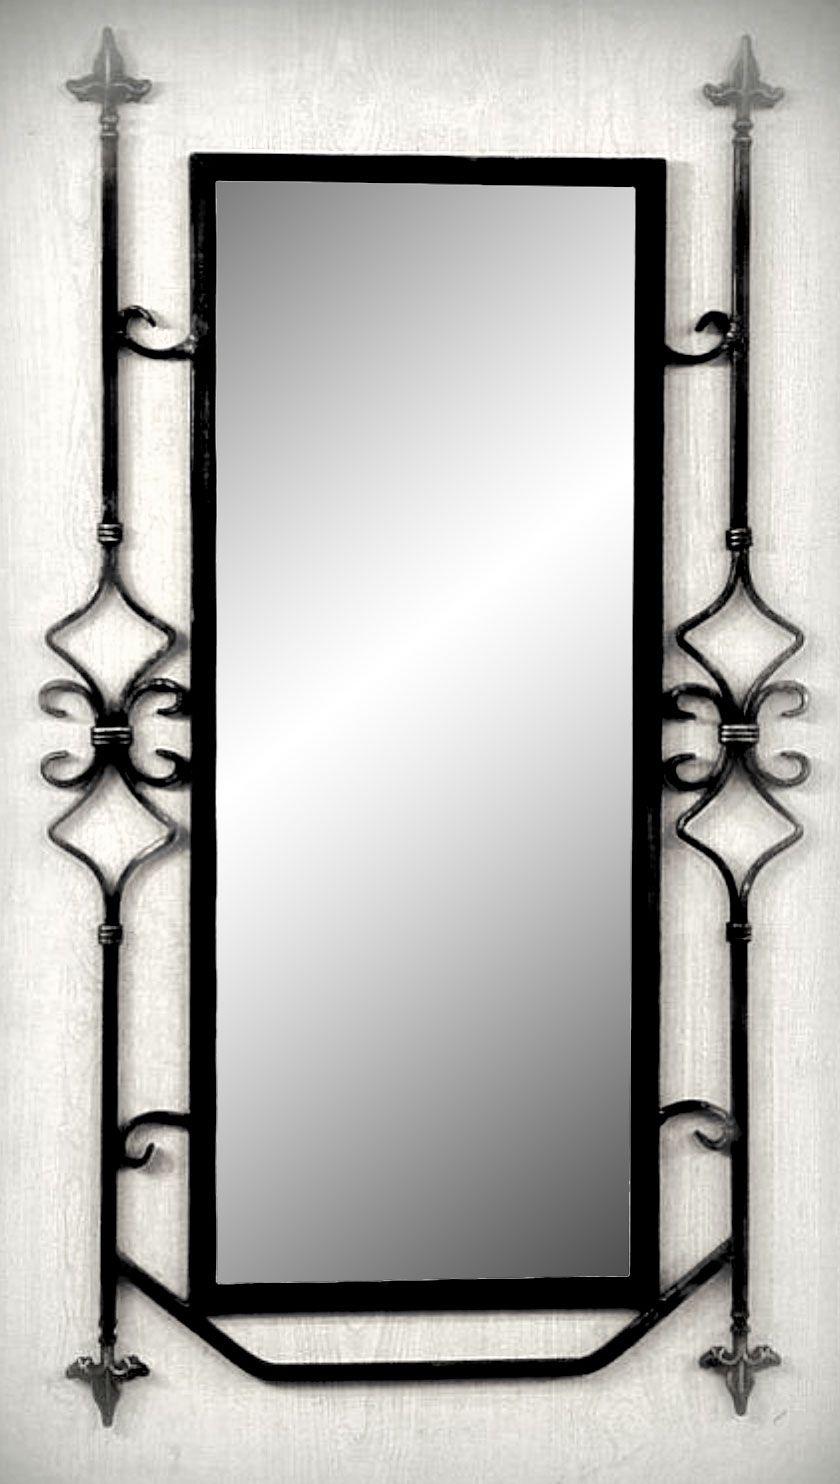 Wrought Iron Mirror Frame Wrought Iron Mirror Frame Design Wrought Iron Design